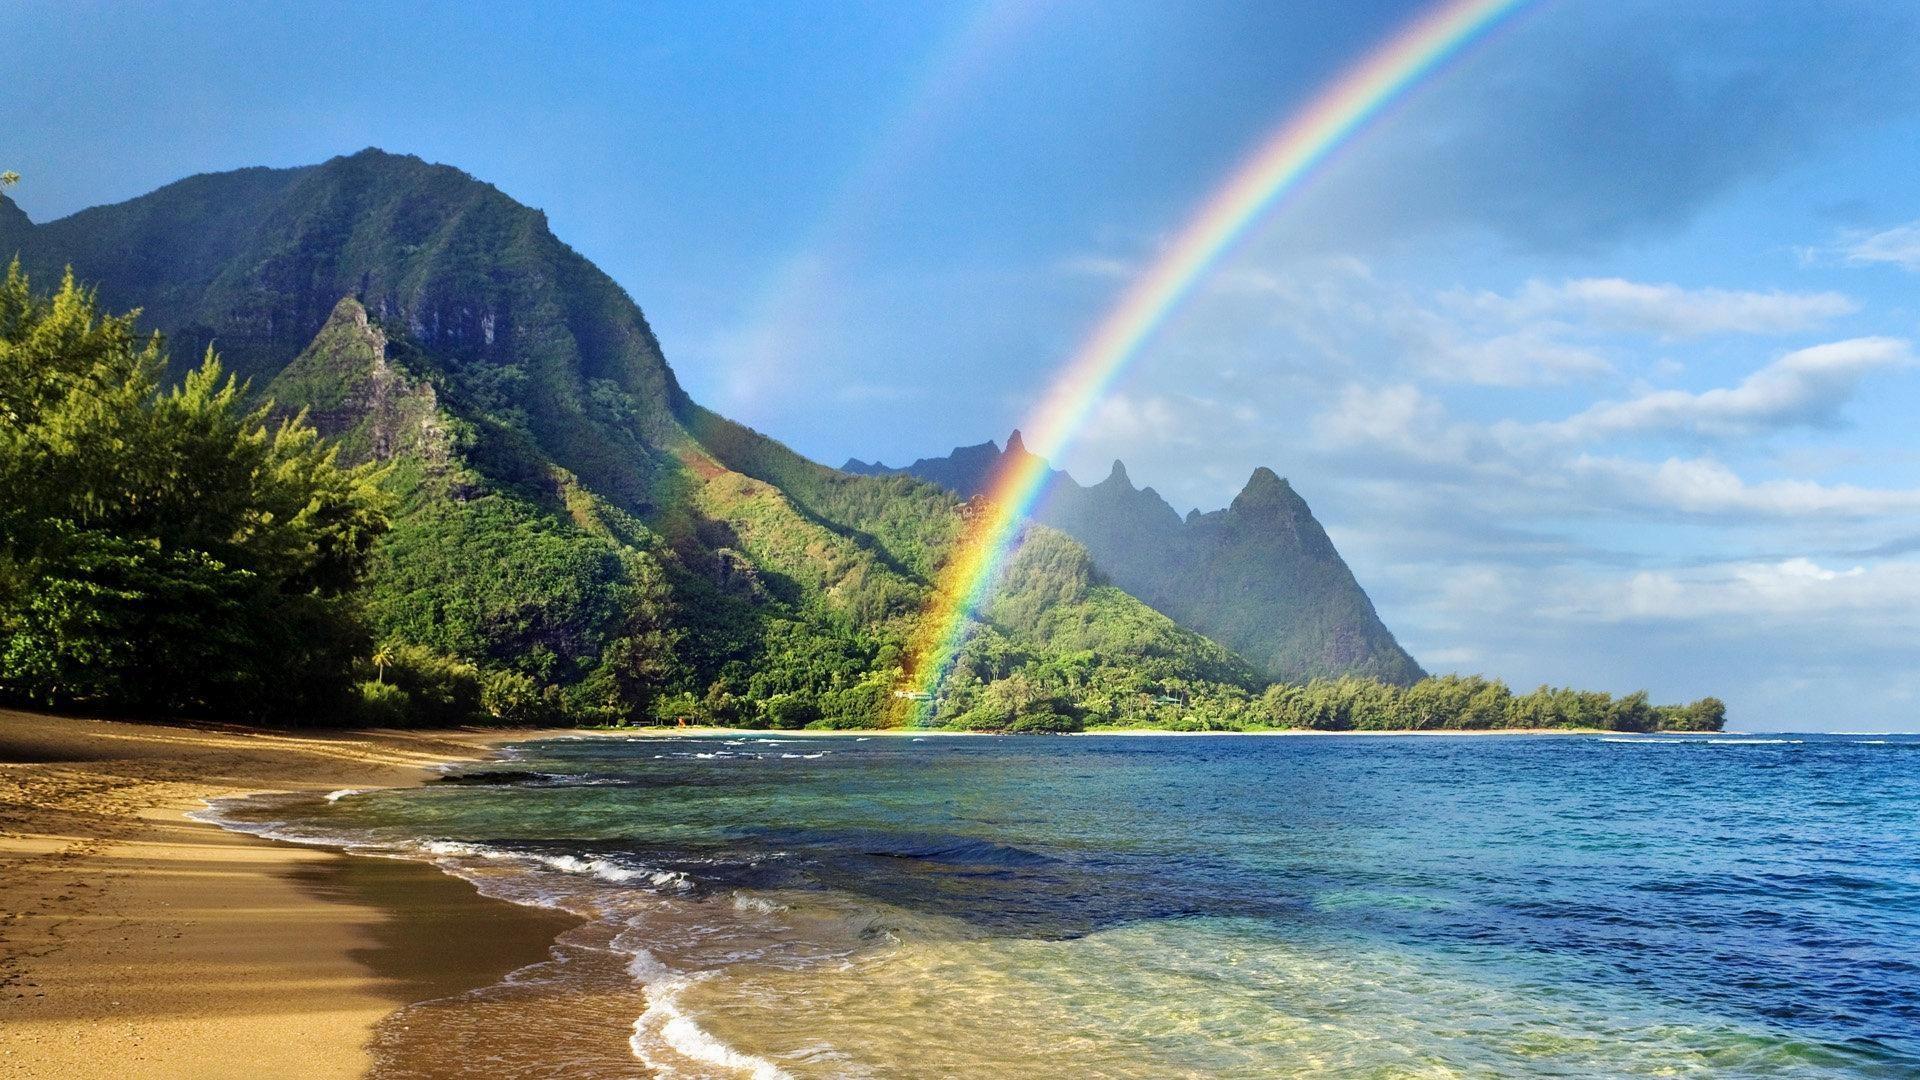 Download-hawaii-1080p-wallpaper